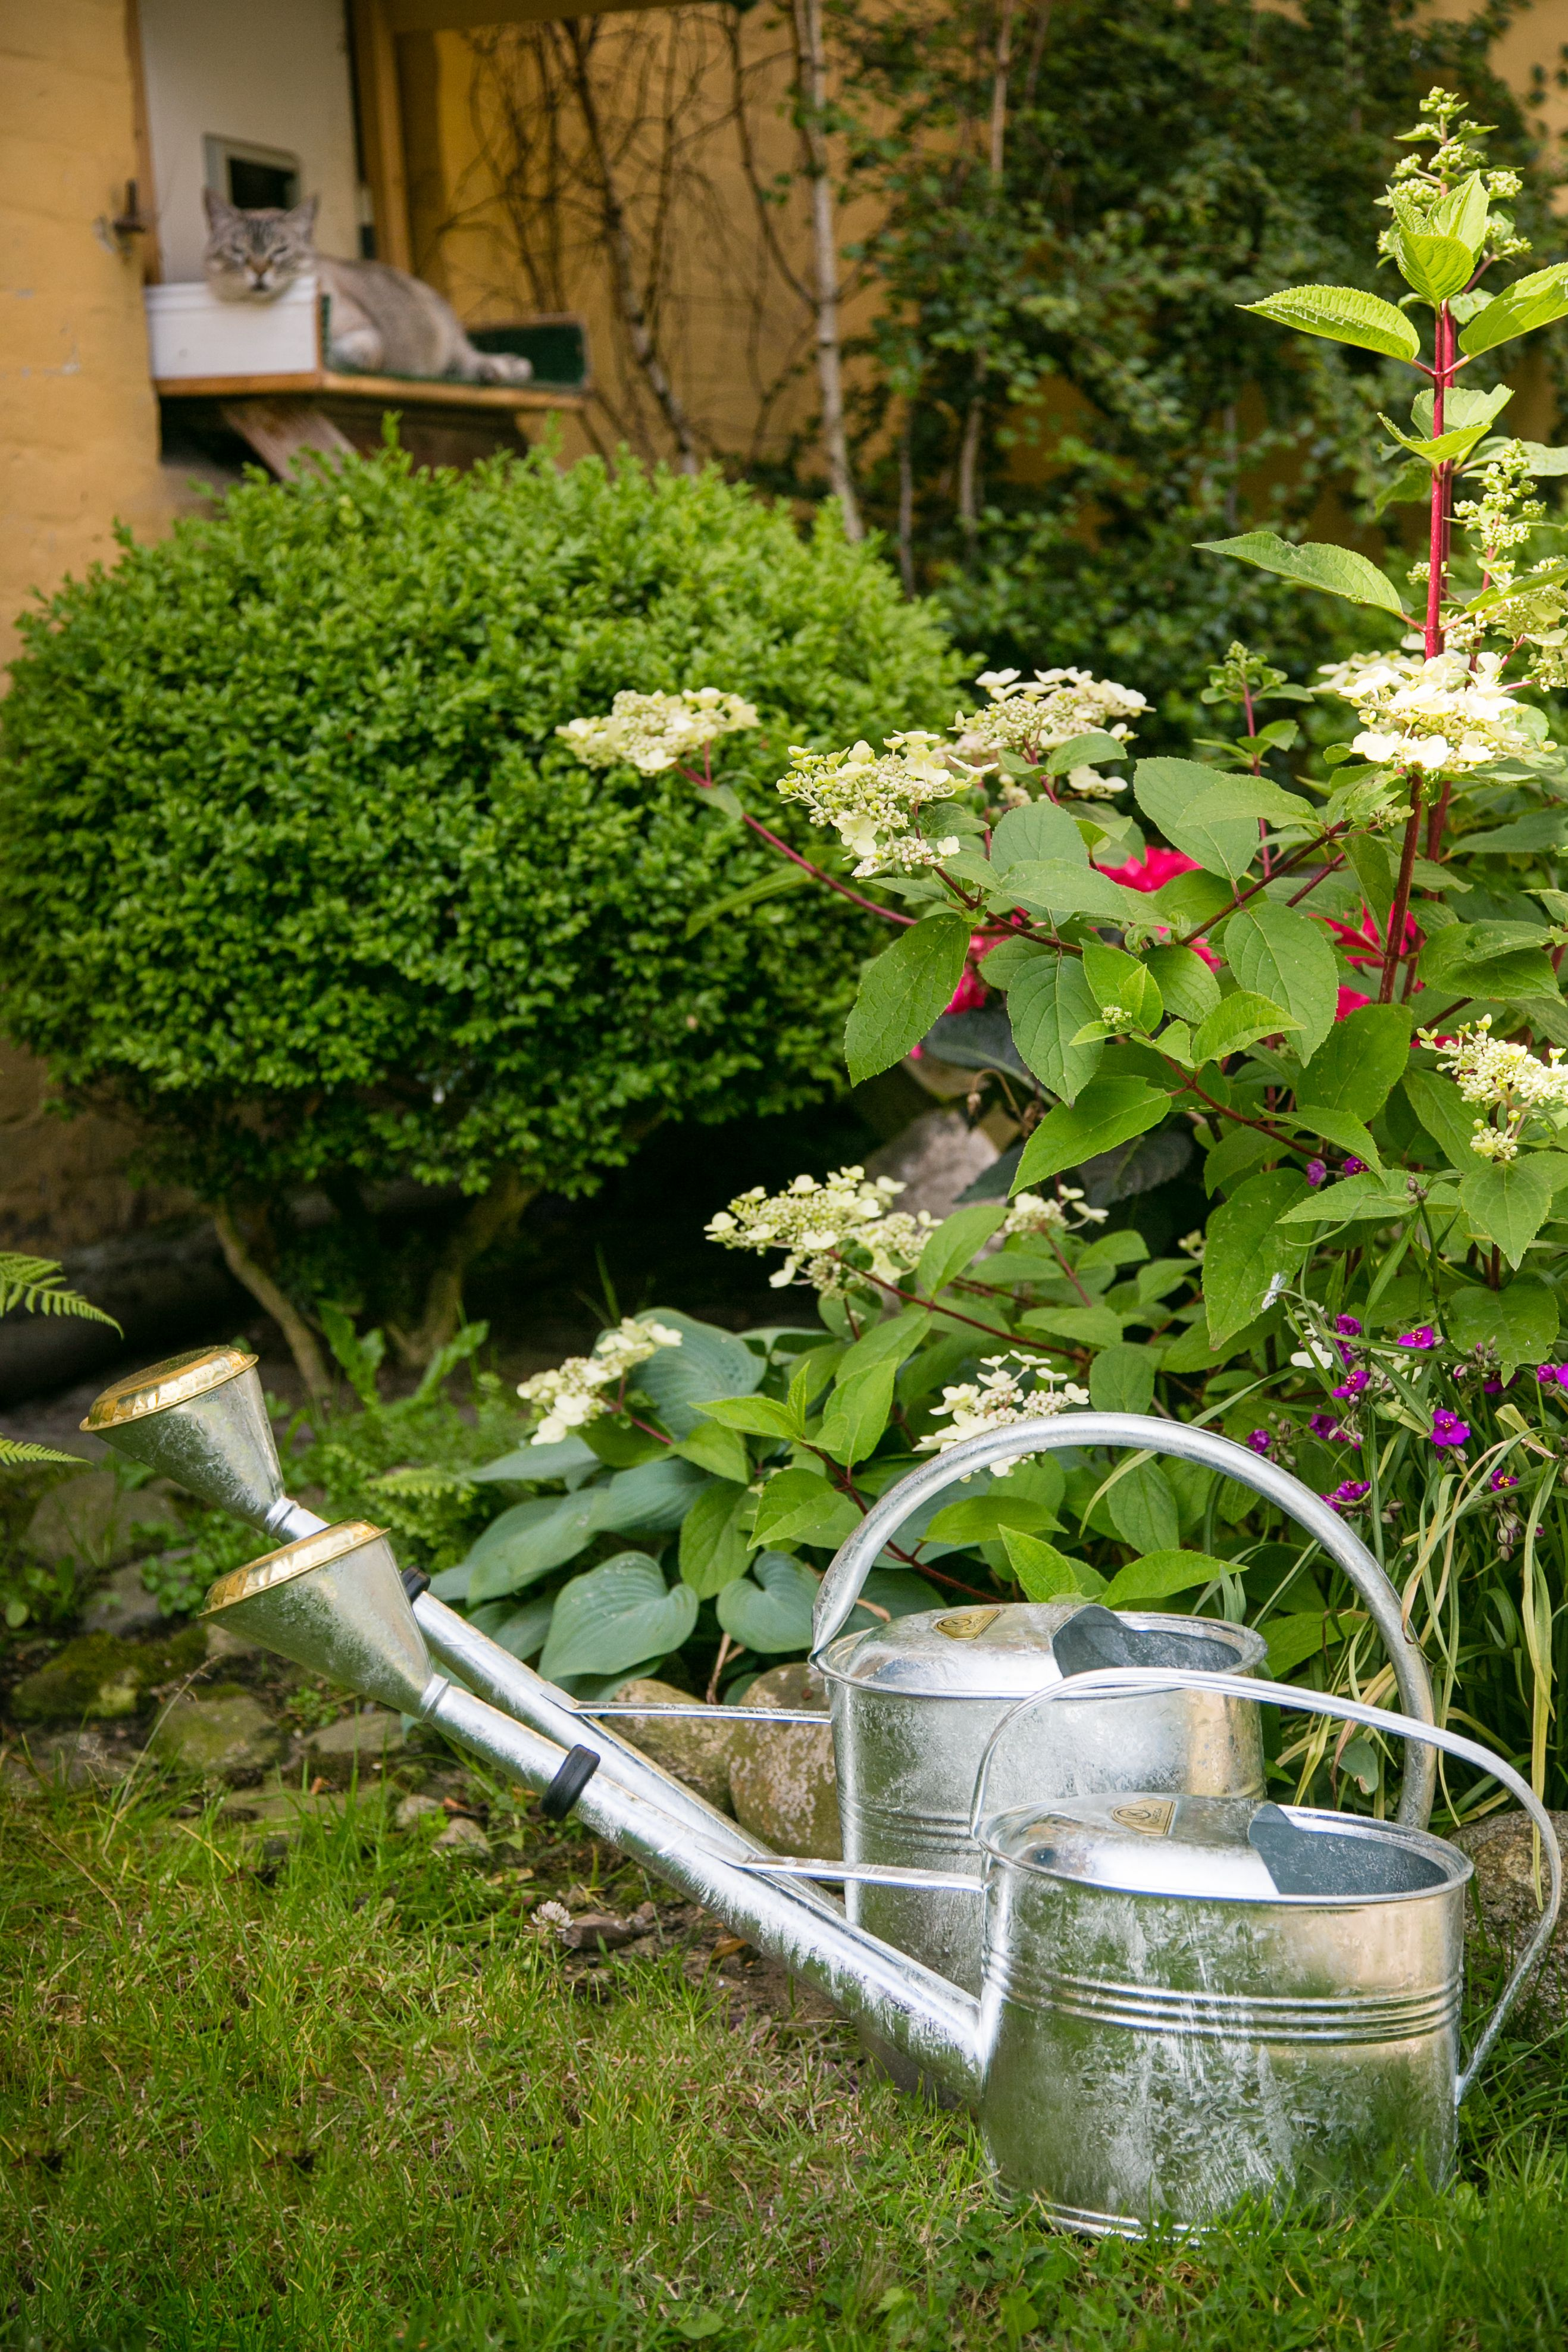 Kuheiga Com Ihr Online Shop Fur Gartenzubehor Wohnaccessoires Garten Pflanzen Garten Ideen